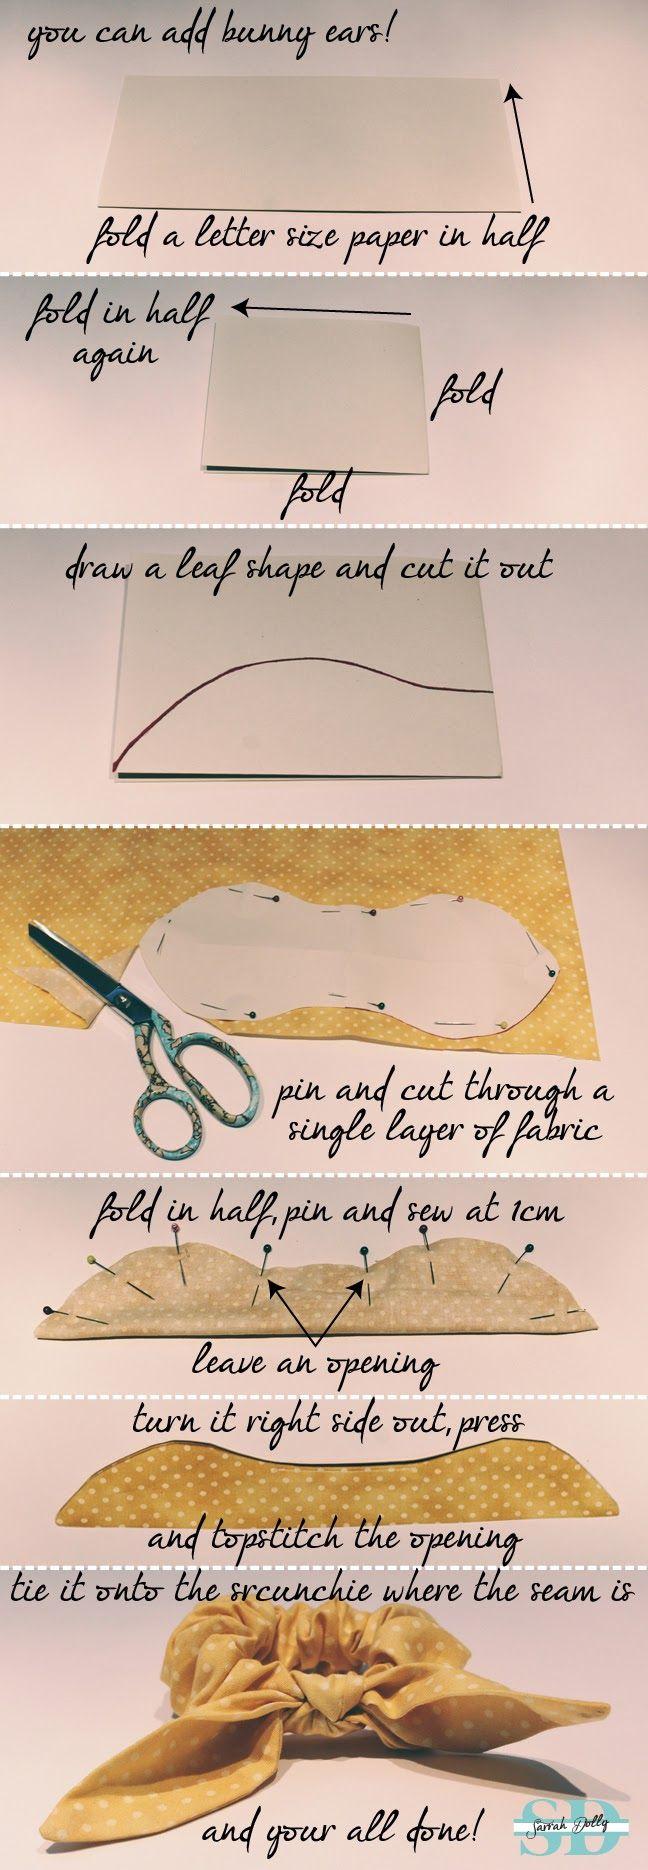 DIY :Scrunchie With Bunny Ears Part 2 #DIY #scrunchie #bunnyears